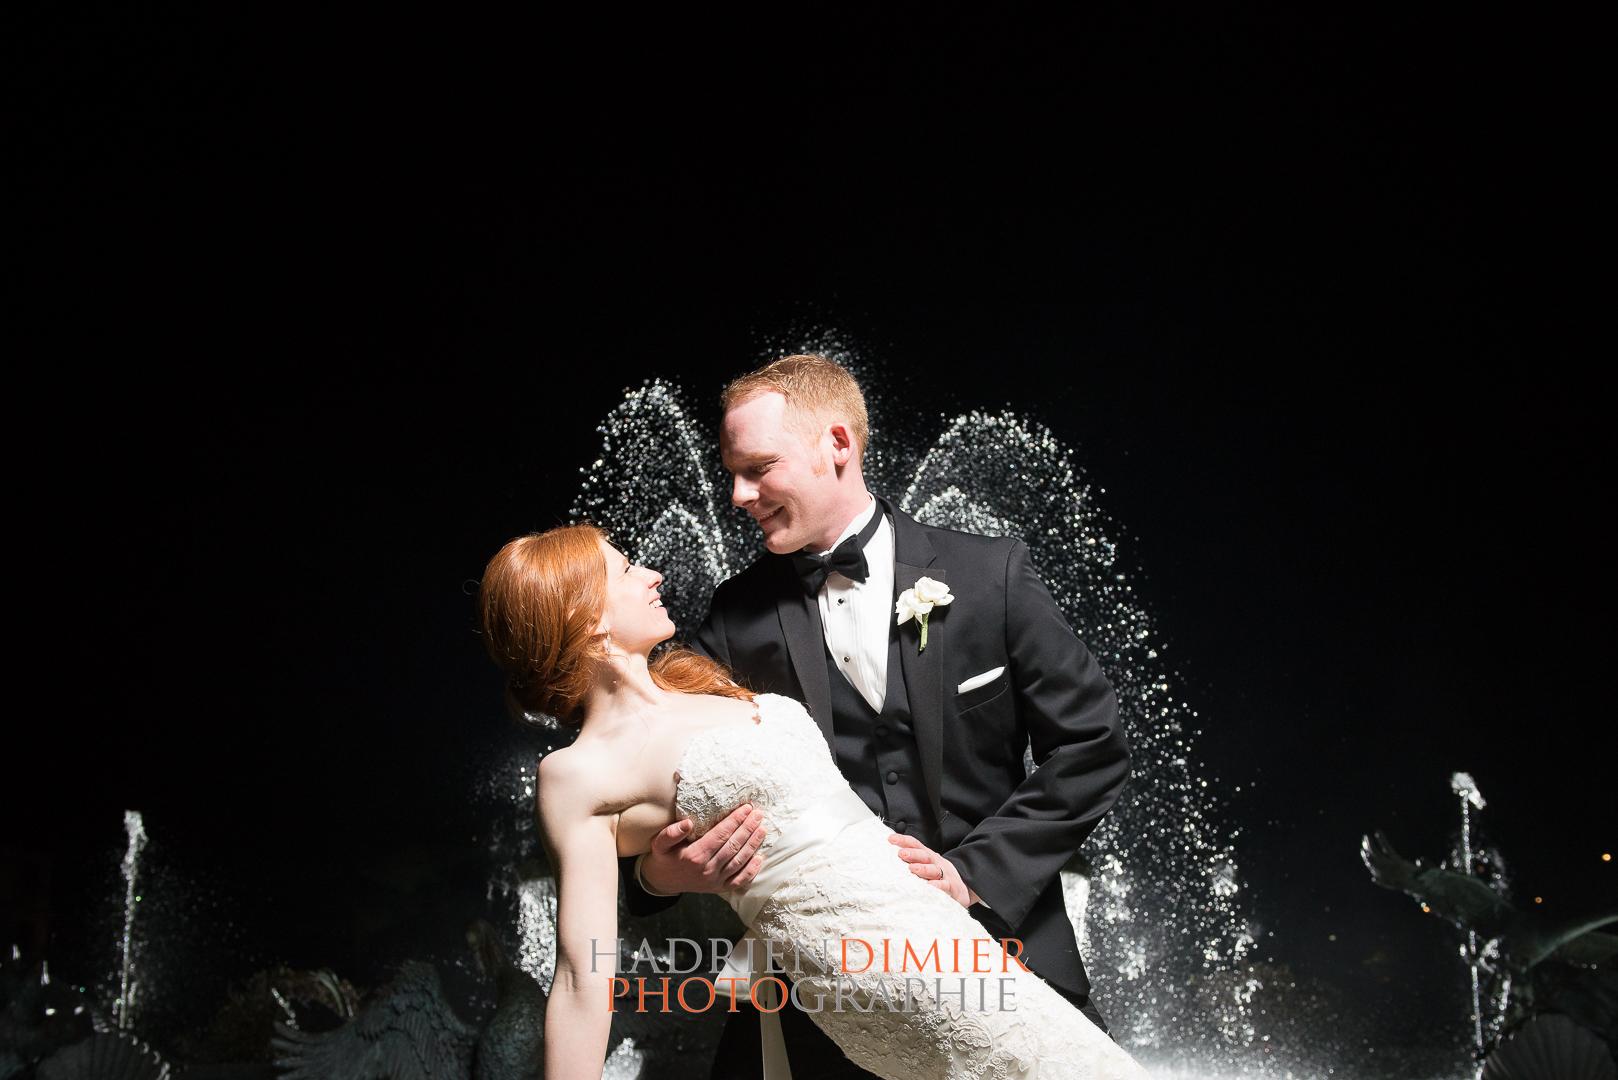 Wilson-Stevens-Productions-Splash-Band-Wedding-Hadrien Dimier Photographie-160422-00171